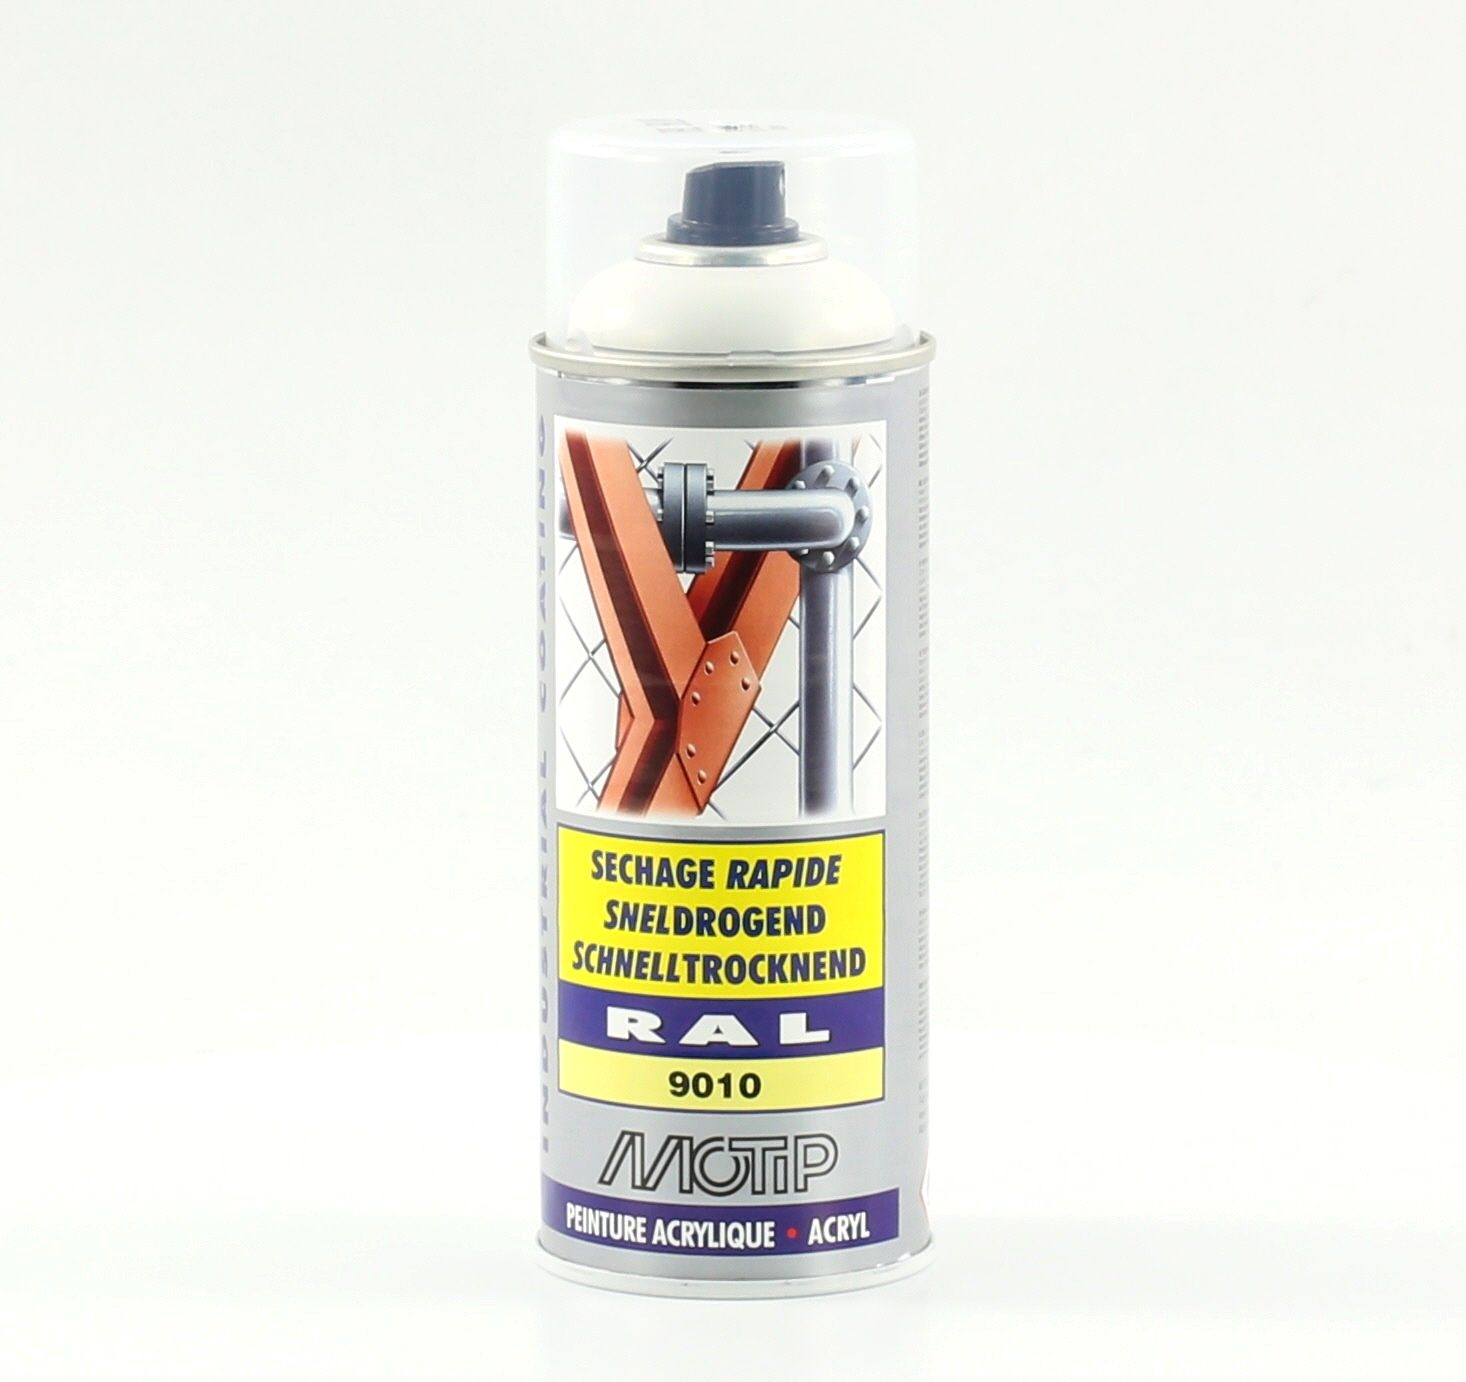 Bombe de peinture MoTip blanc pur brillant acrylique RAL 9010 400 ml M07040